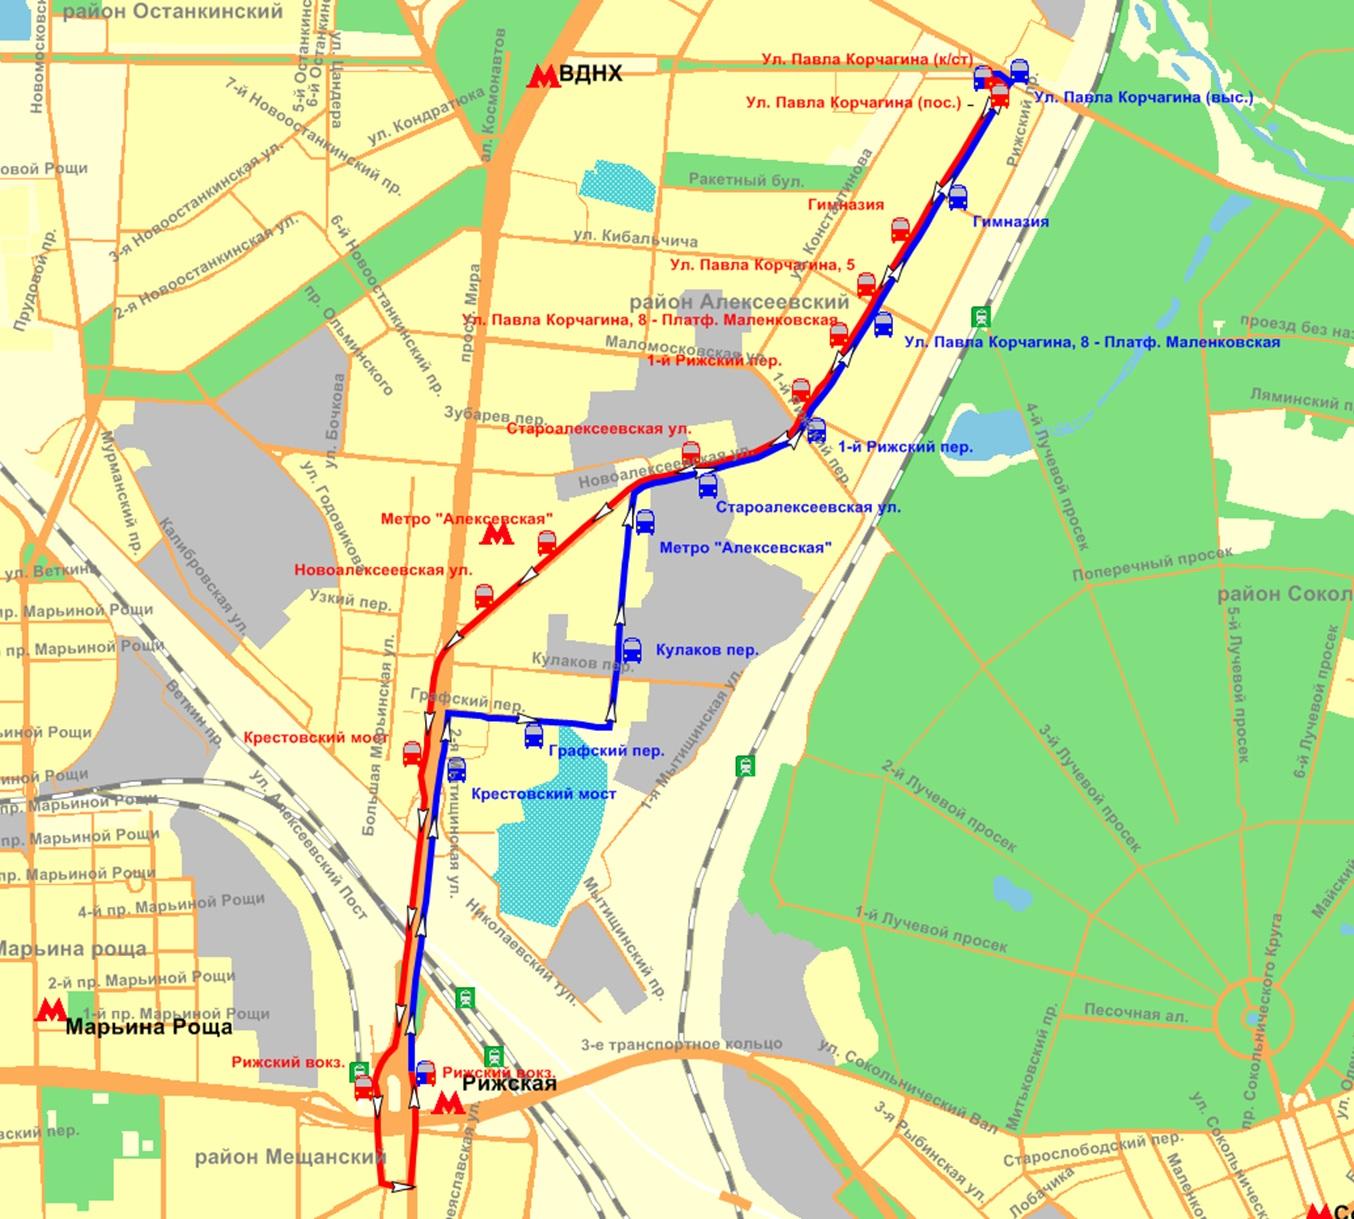 схема движения 77 маршрута